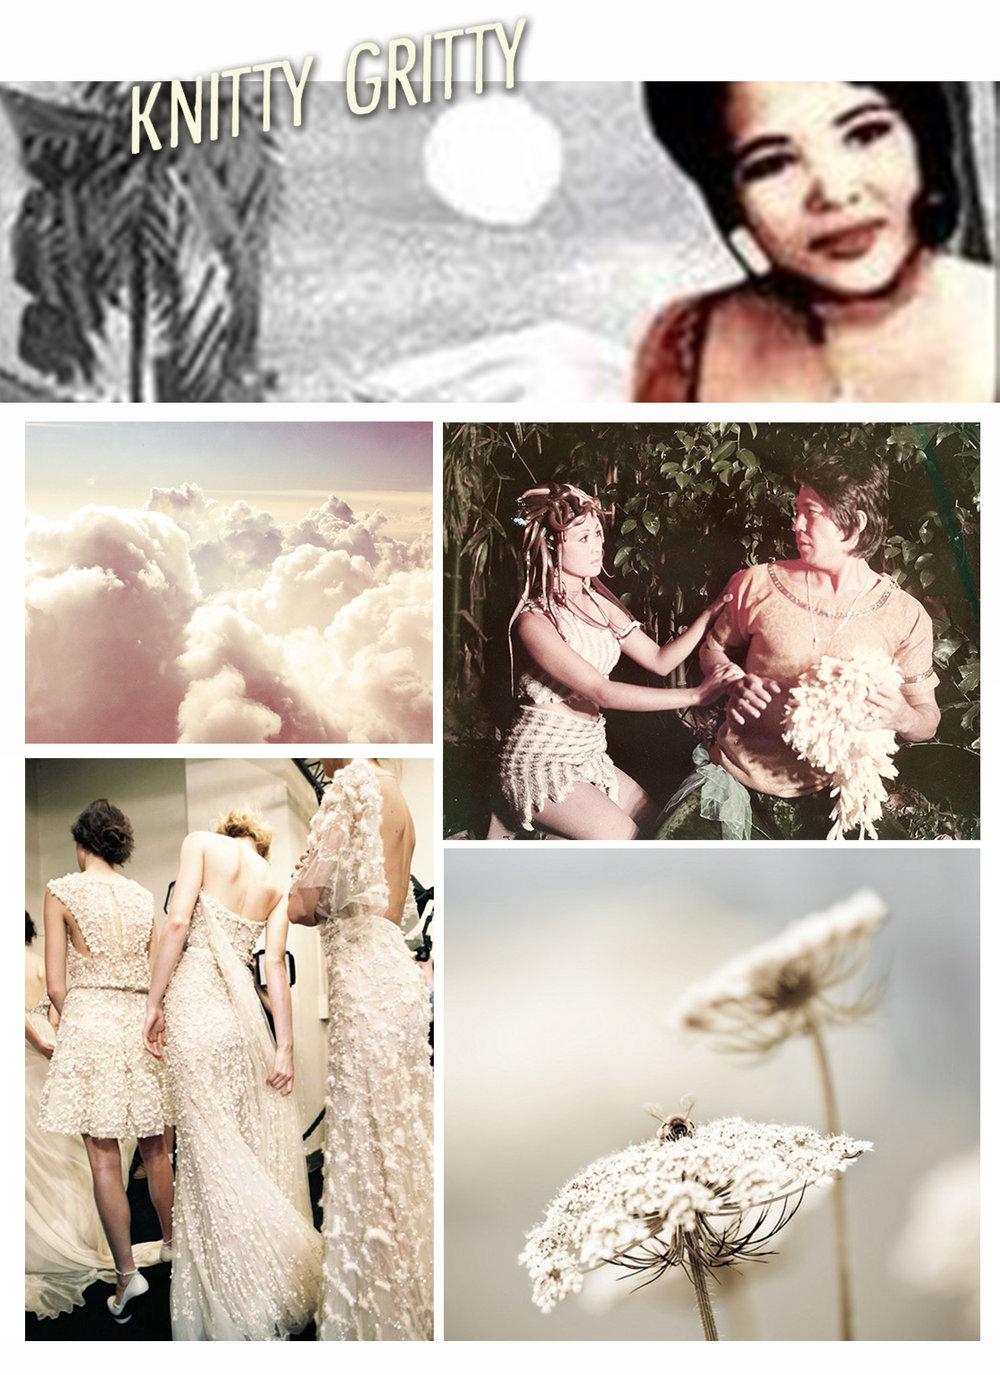 Jessica_Faulkner_Spring_2015_Mood_Board_Knitty_Gritty.jpg